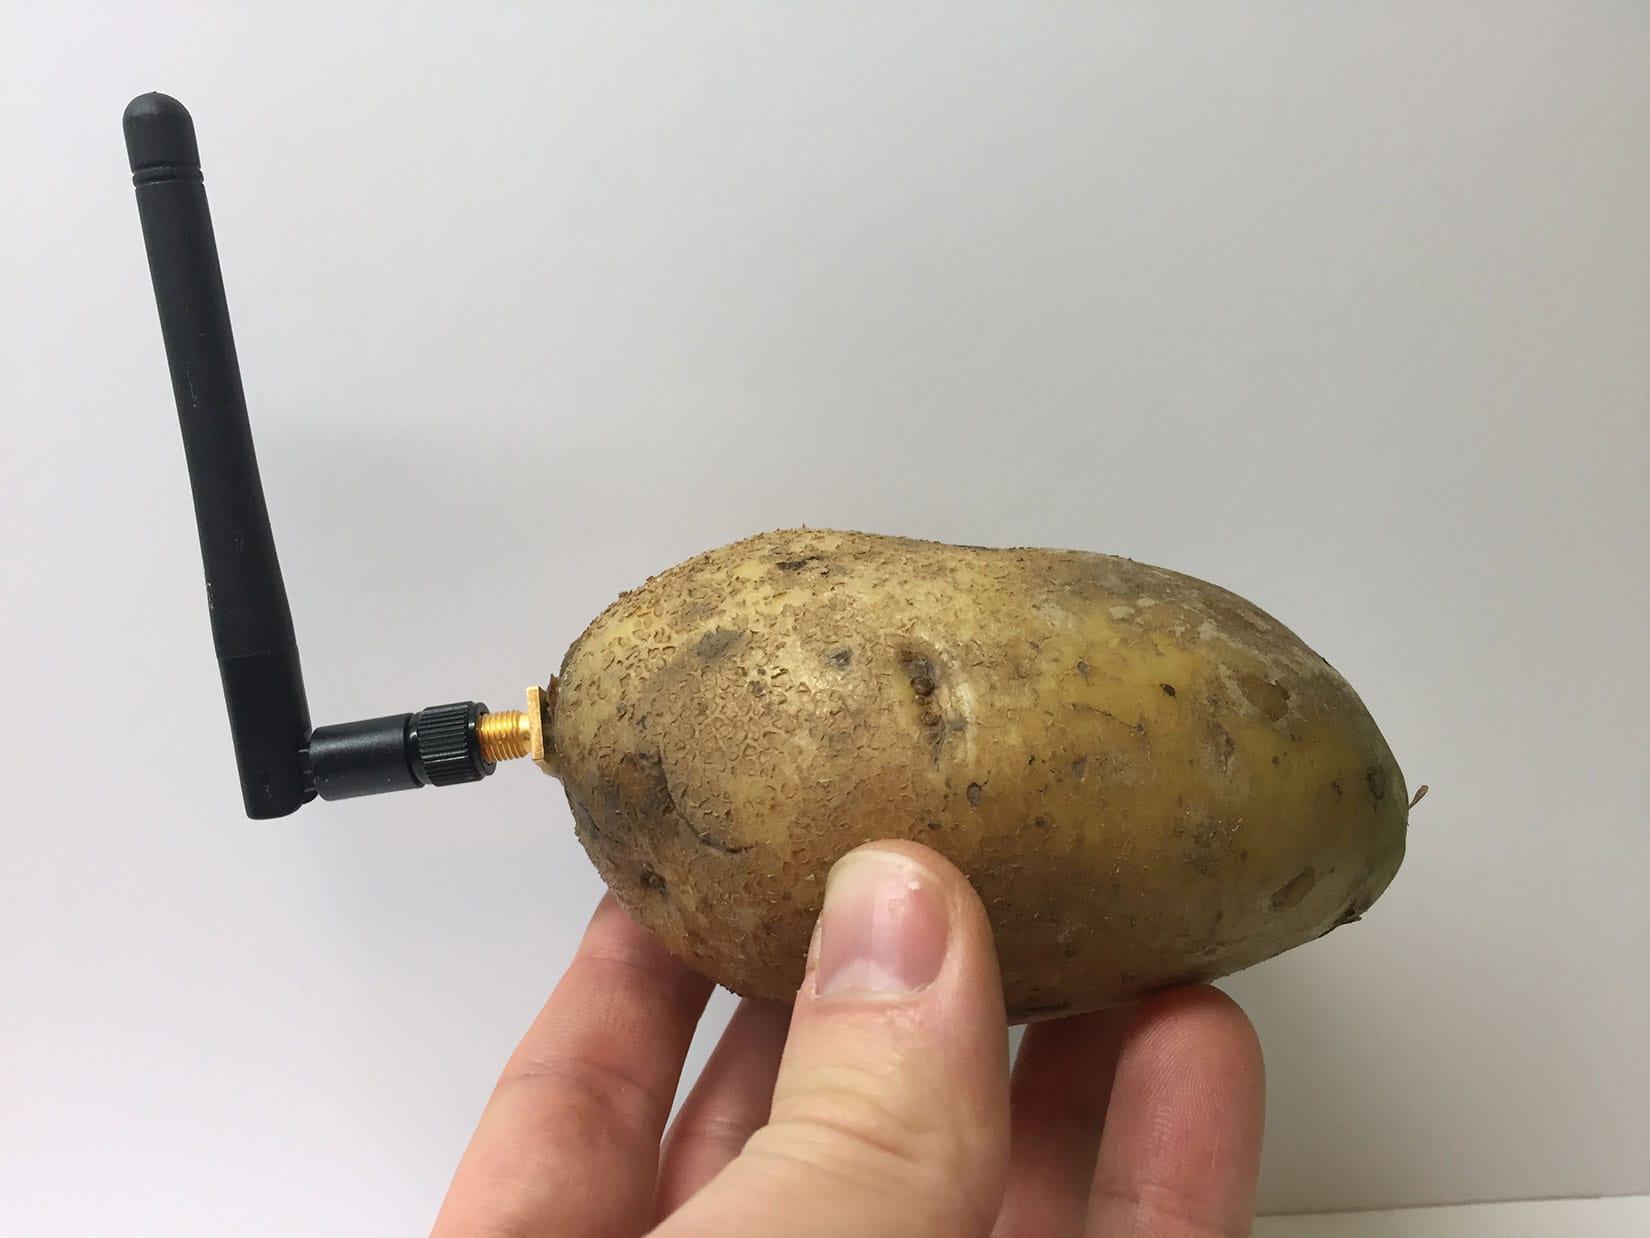 Smart Potato gag at CES 2020